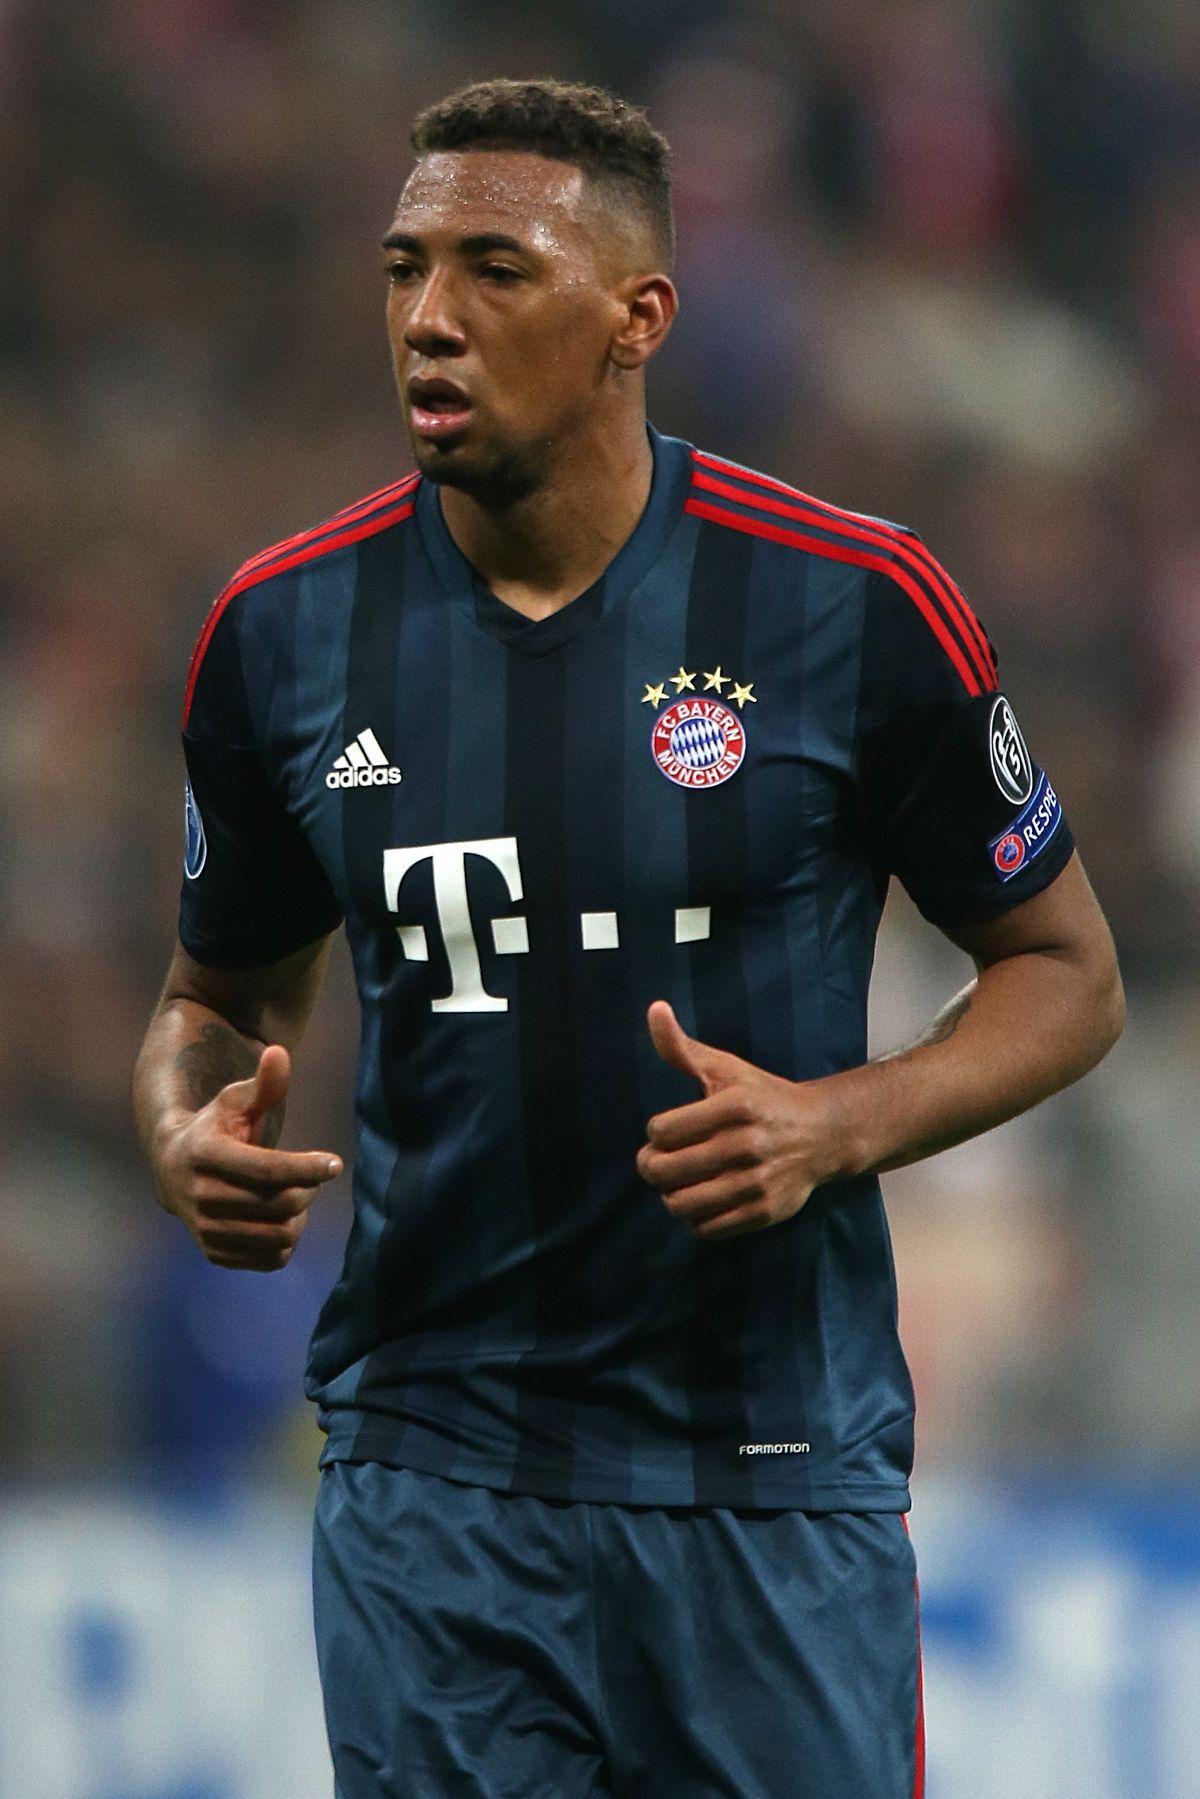 Soccer - UEFA Champions League - Group D - Bayern Munich v Manchester City - Allianz Arena